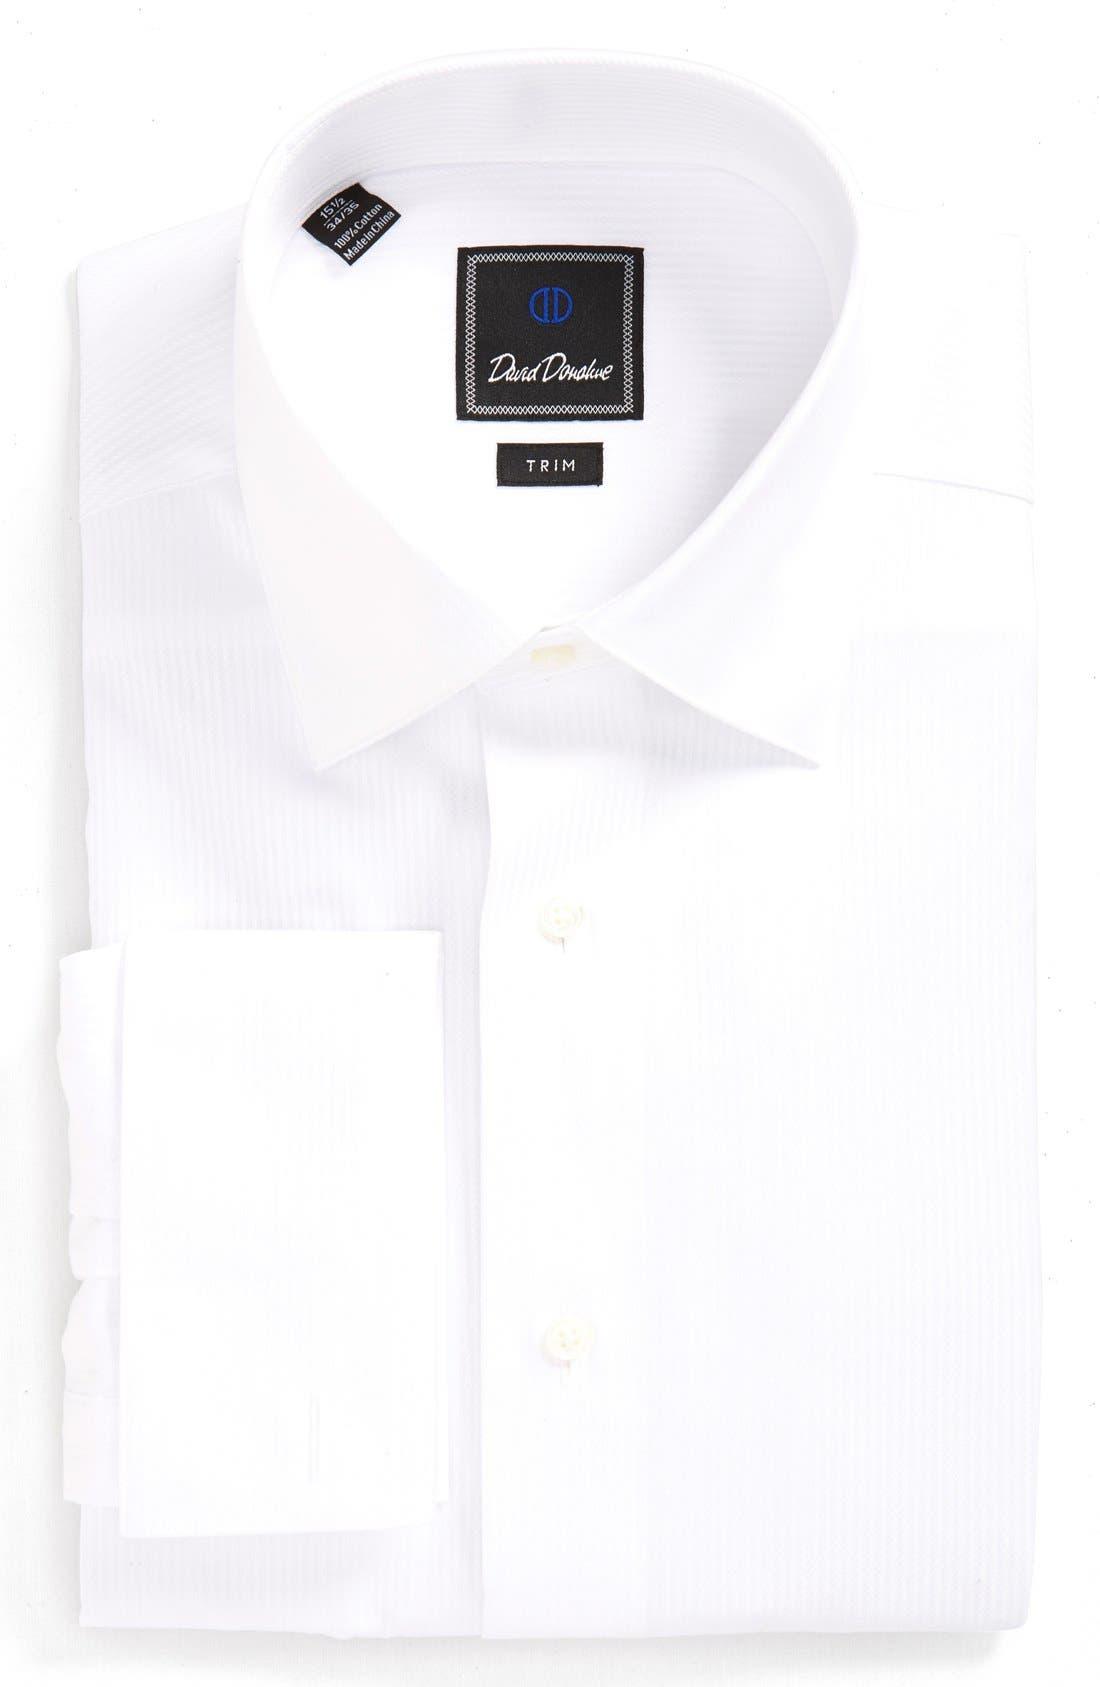 Alternate Image 1 Selected - David Donahue Trim Fit Stripe Tuxedo Shirt